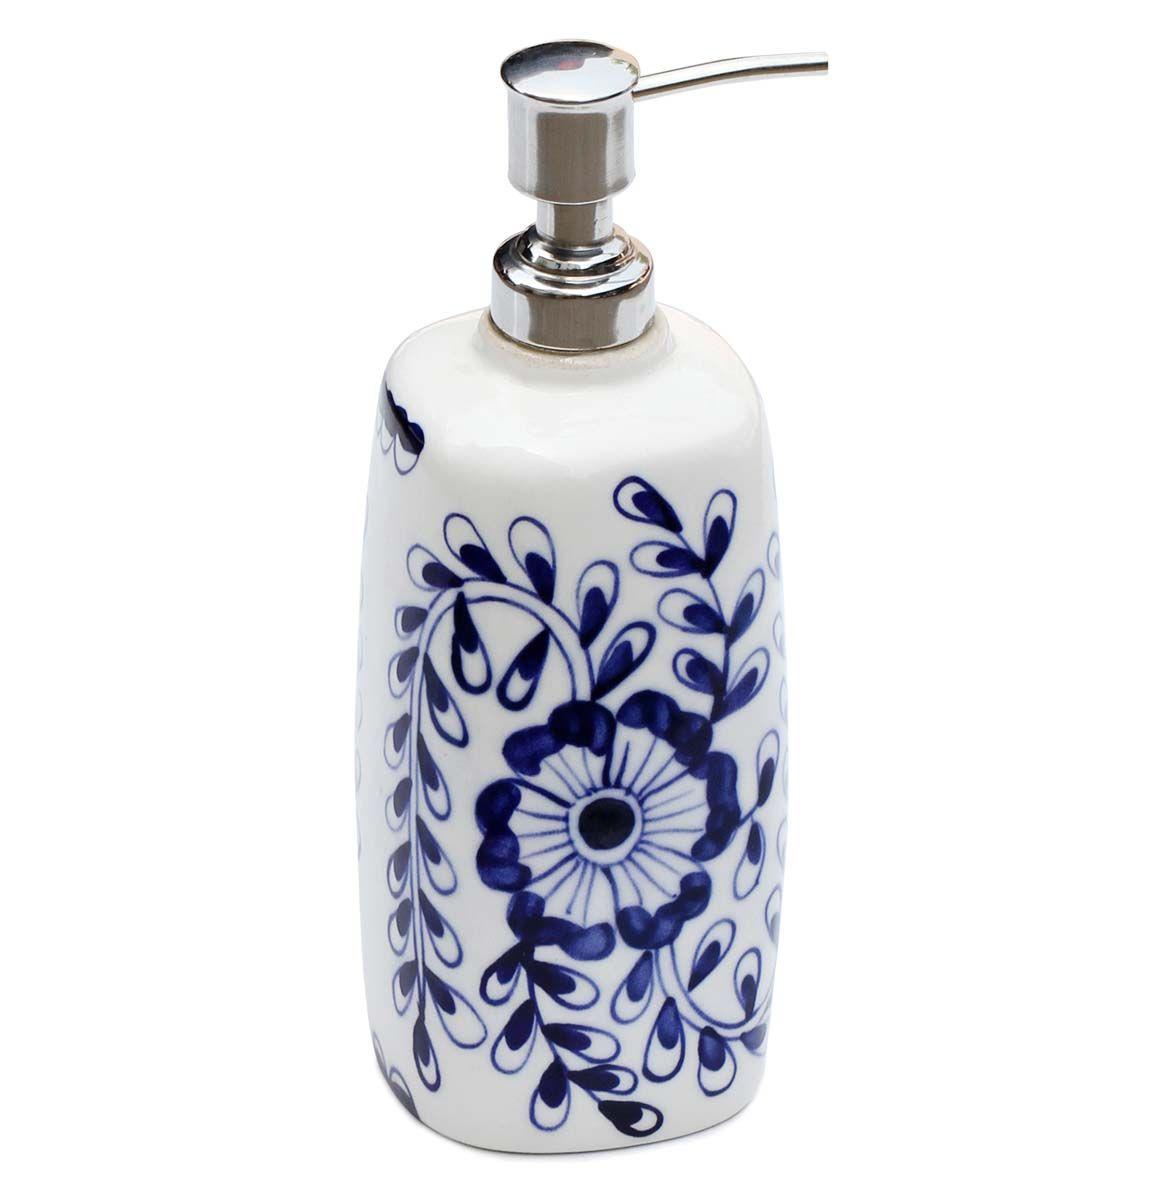 Blue Blooms - Blue and White Ceramic Liquid Soap / Lotion Dispenser ...